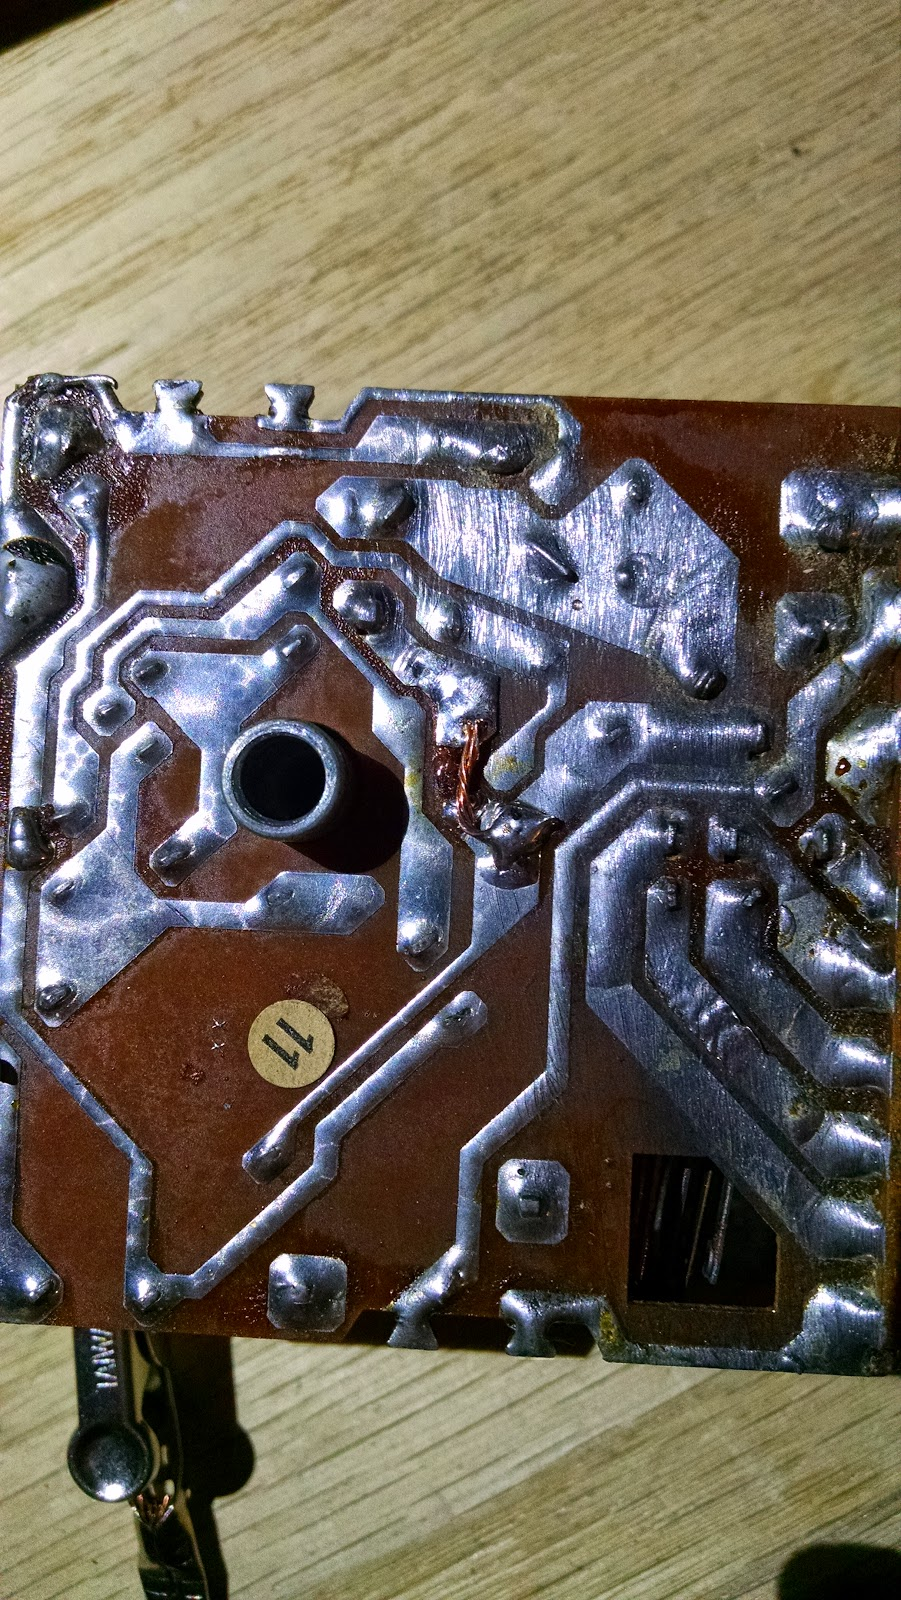 1915cc vw engine diagram wiring library 1915cc vw engine diagram [ 901 x 1600 Pixel ]